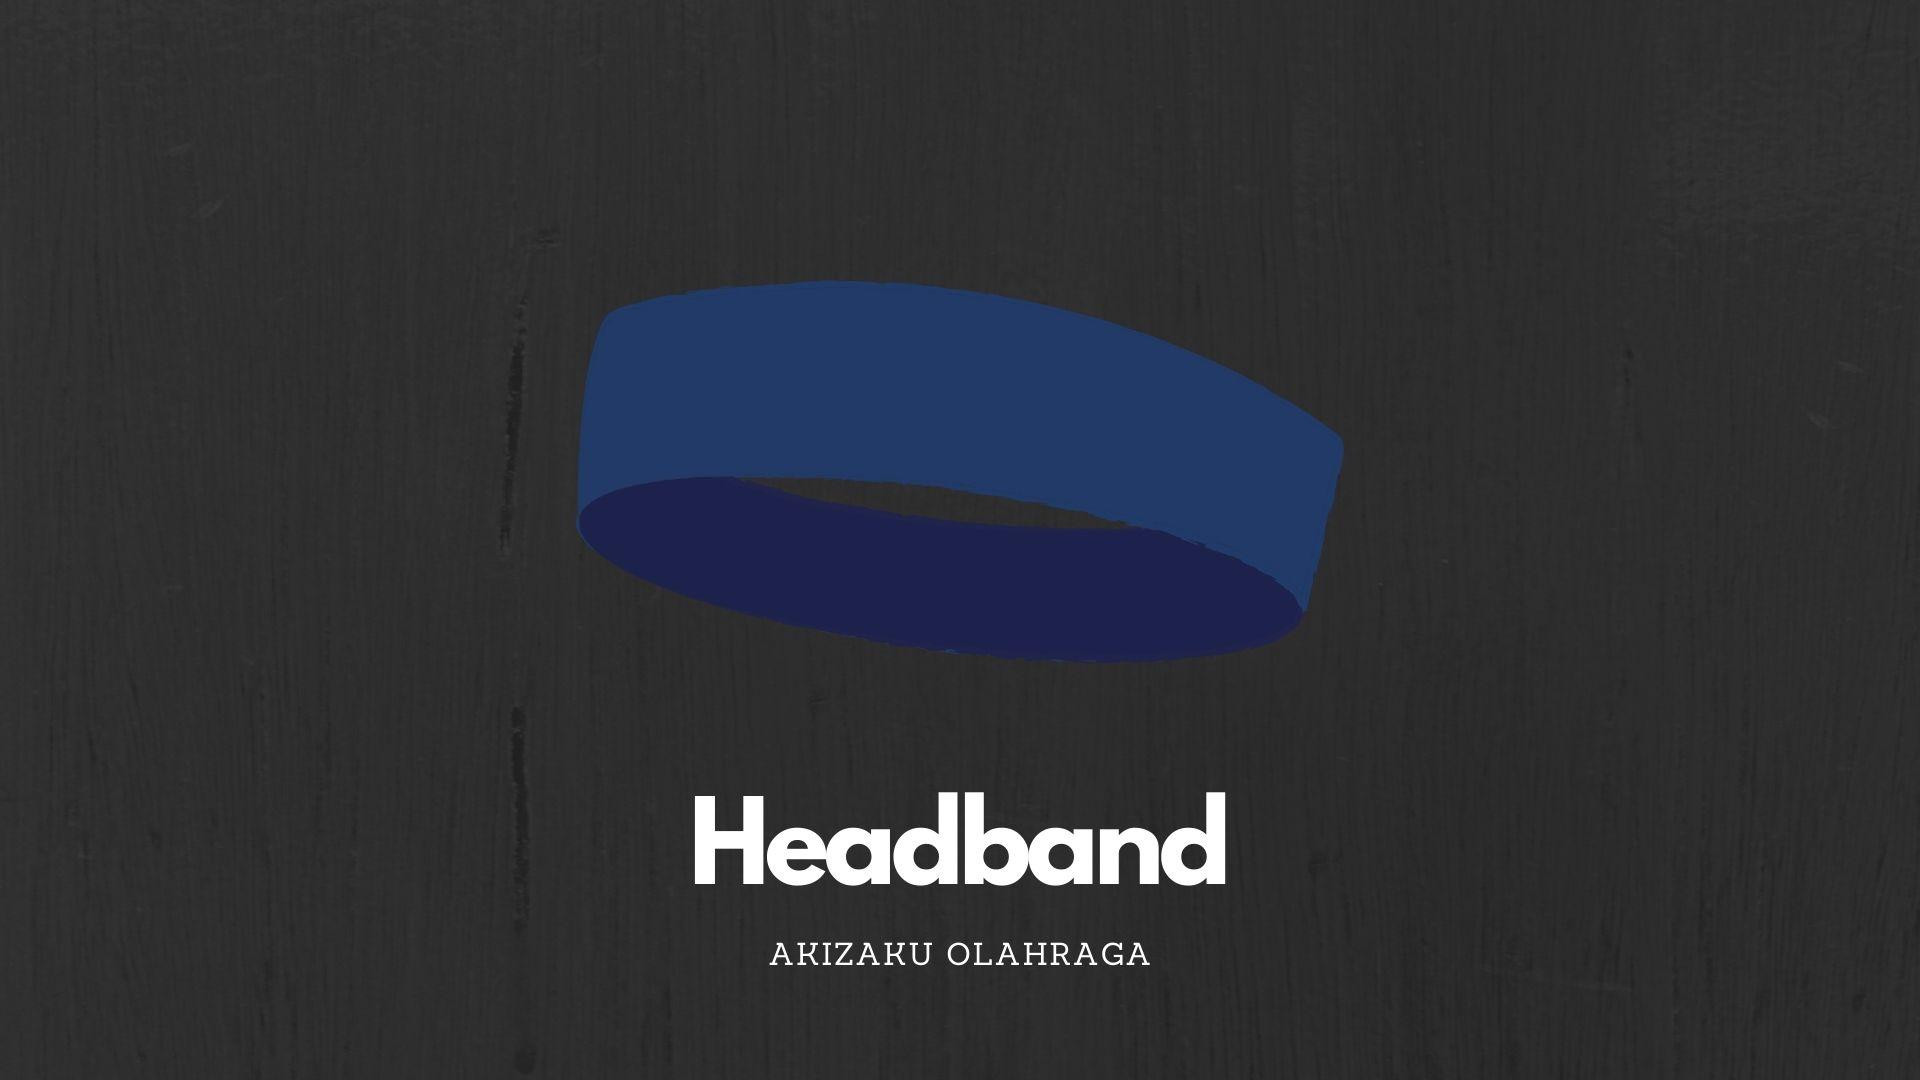 [Image: Headband.jpg]